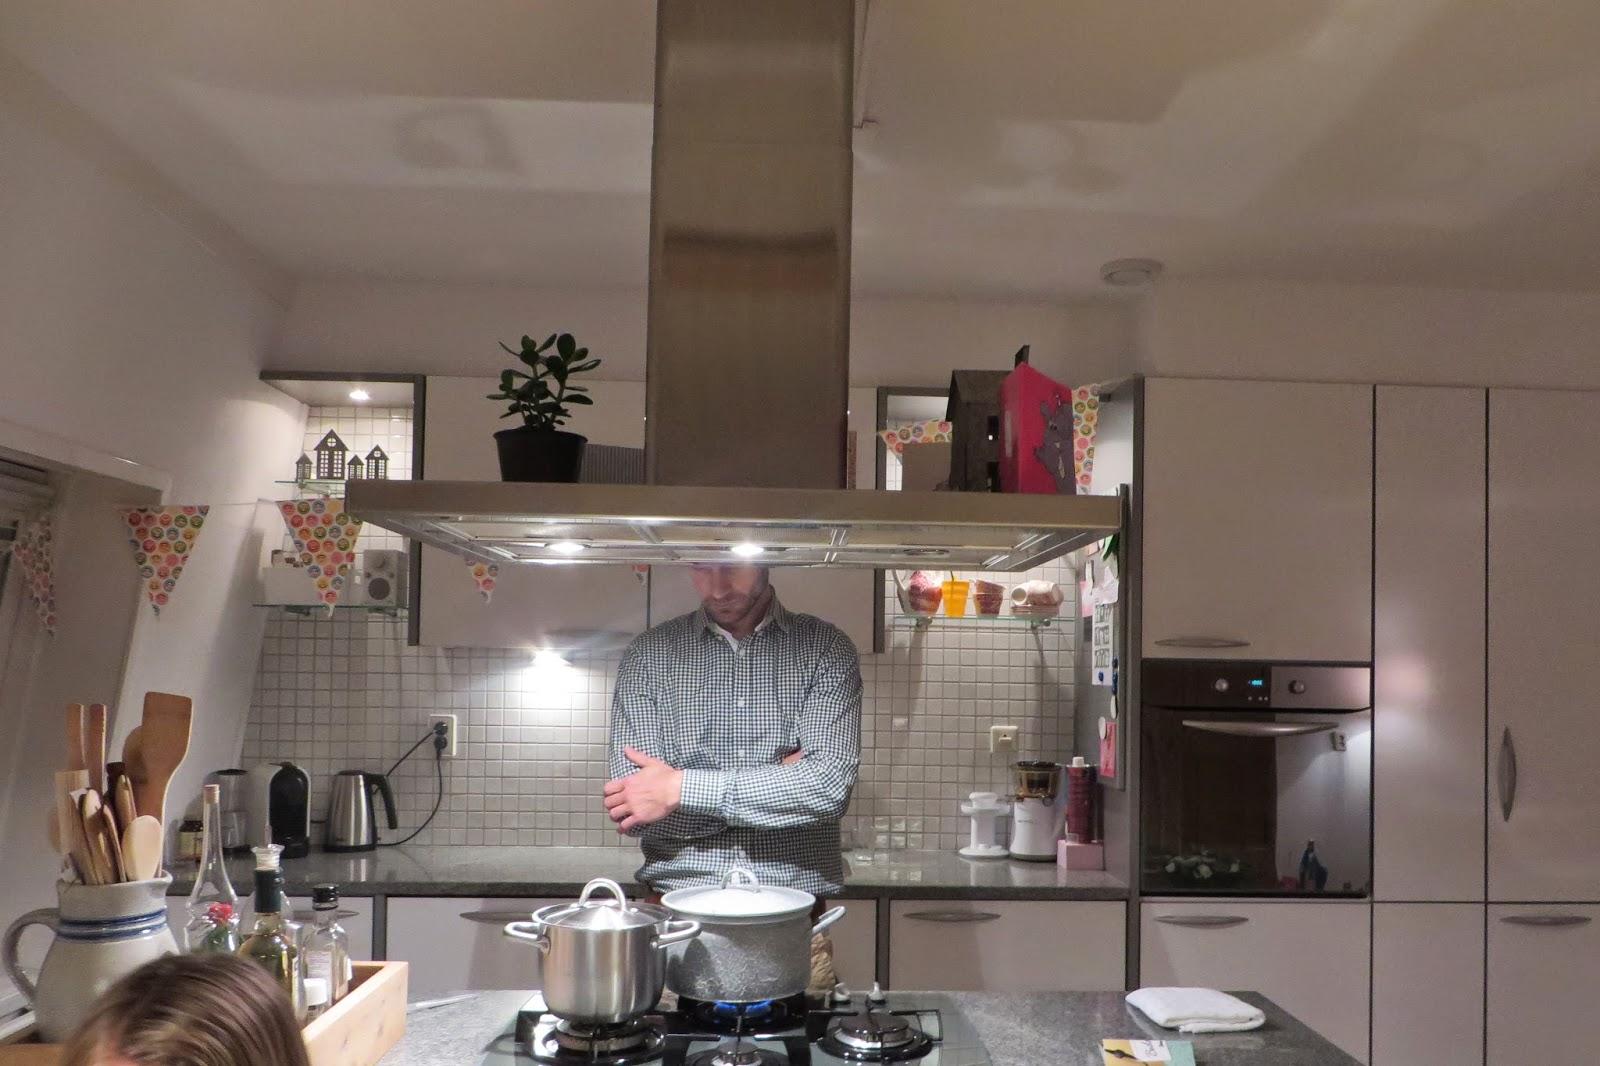 Keuken Gordijnen Hema – Atumre.com